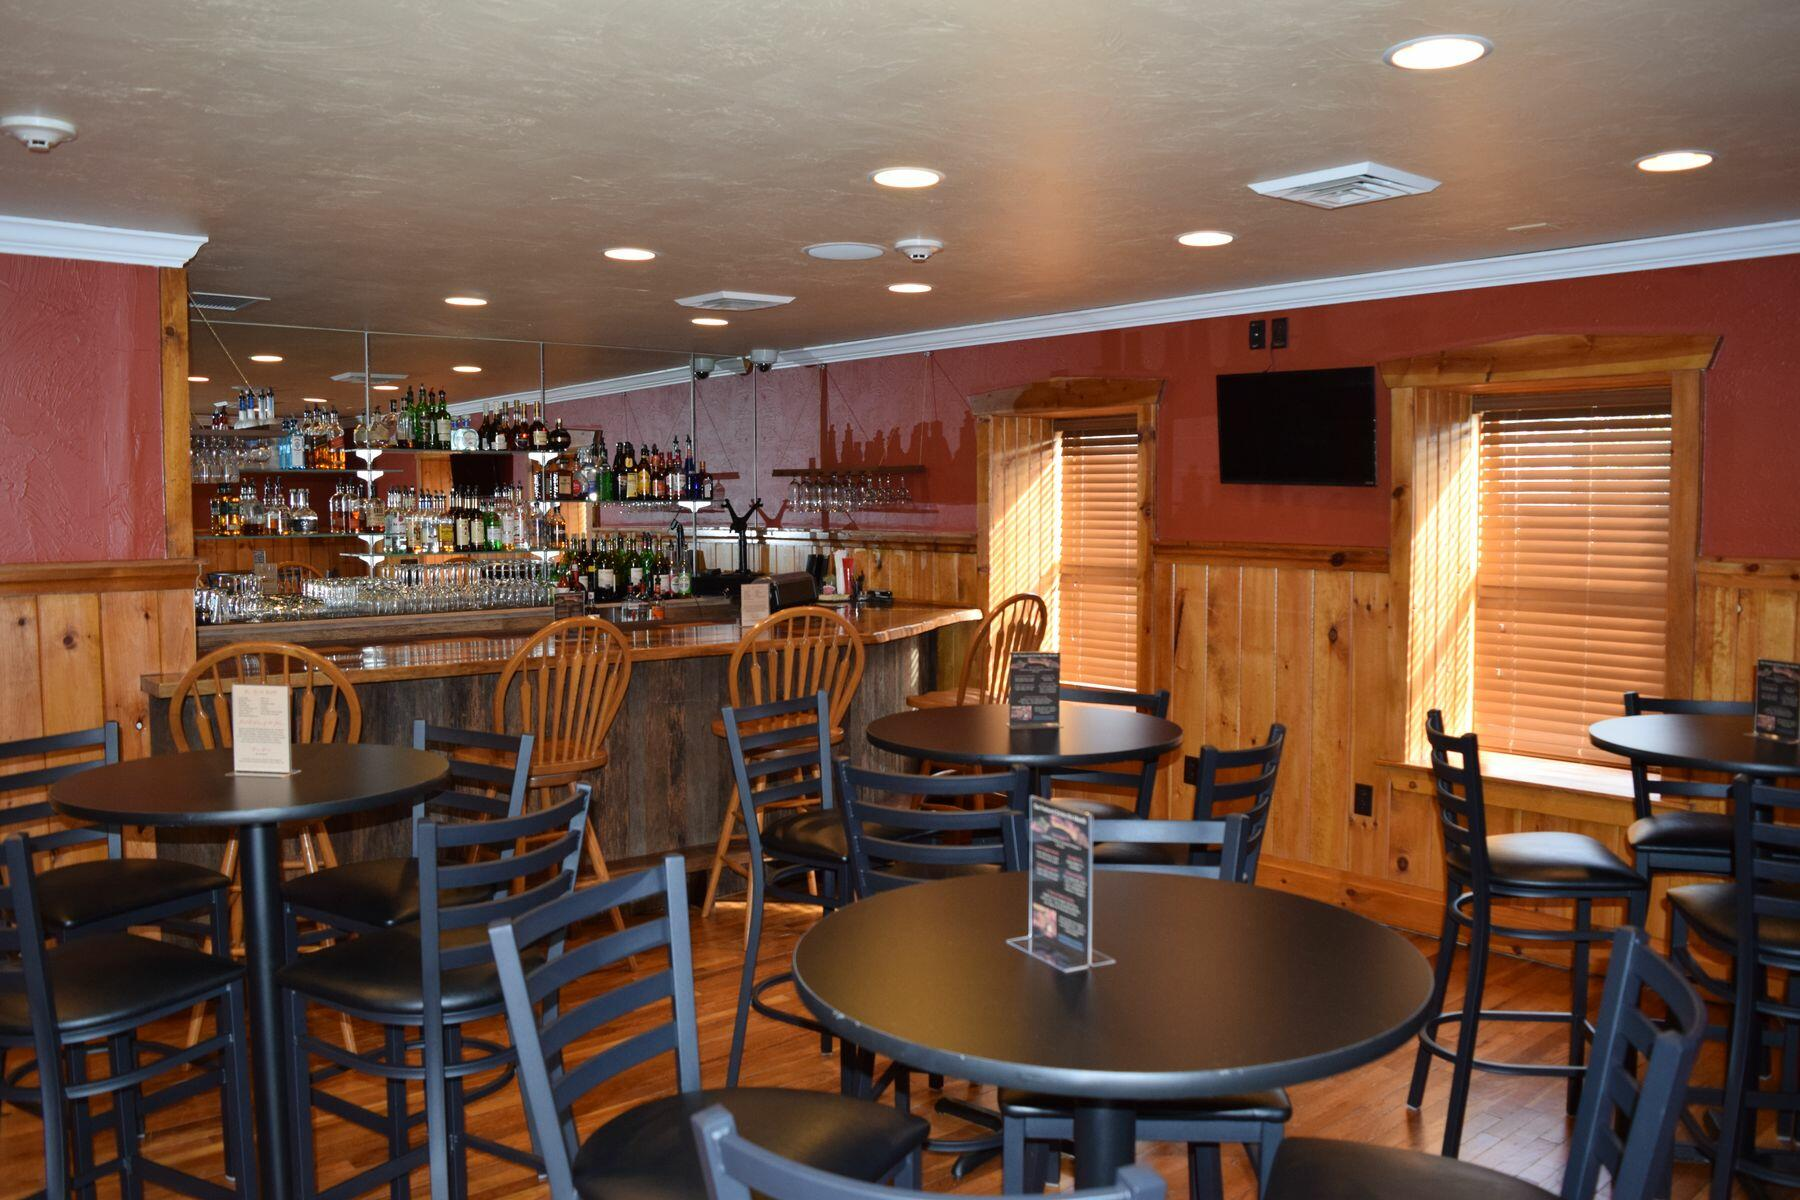 Bar and table seating in Gloryridge Tavern.